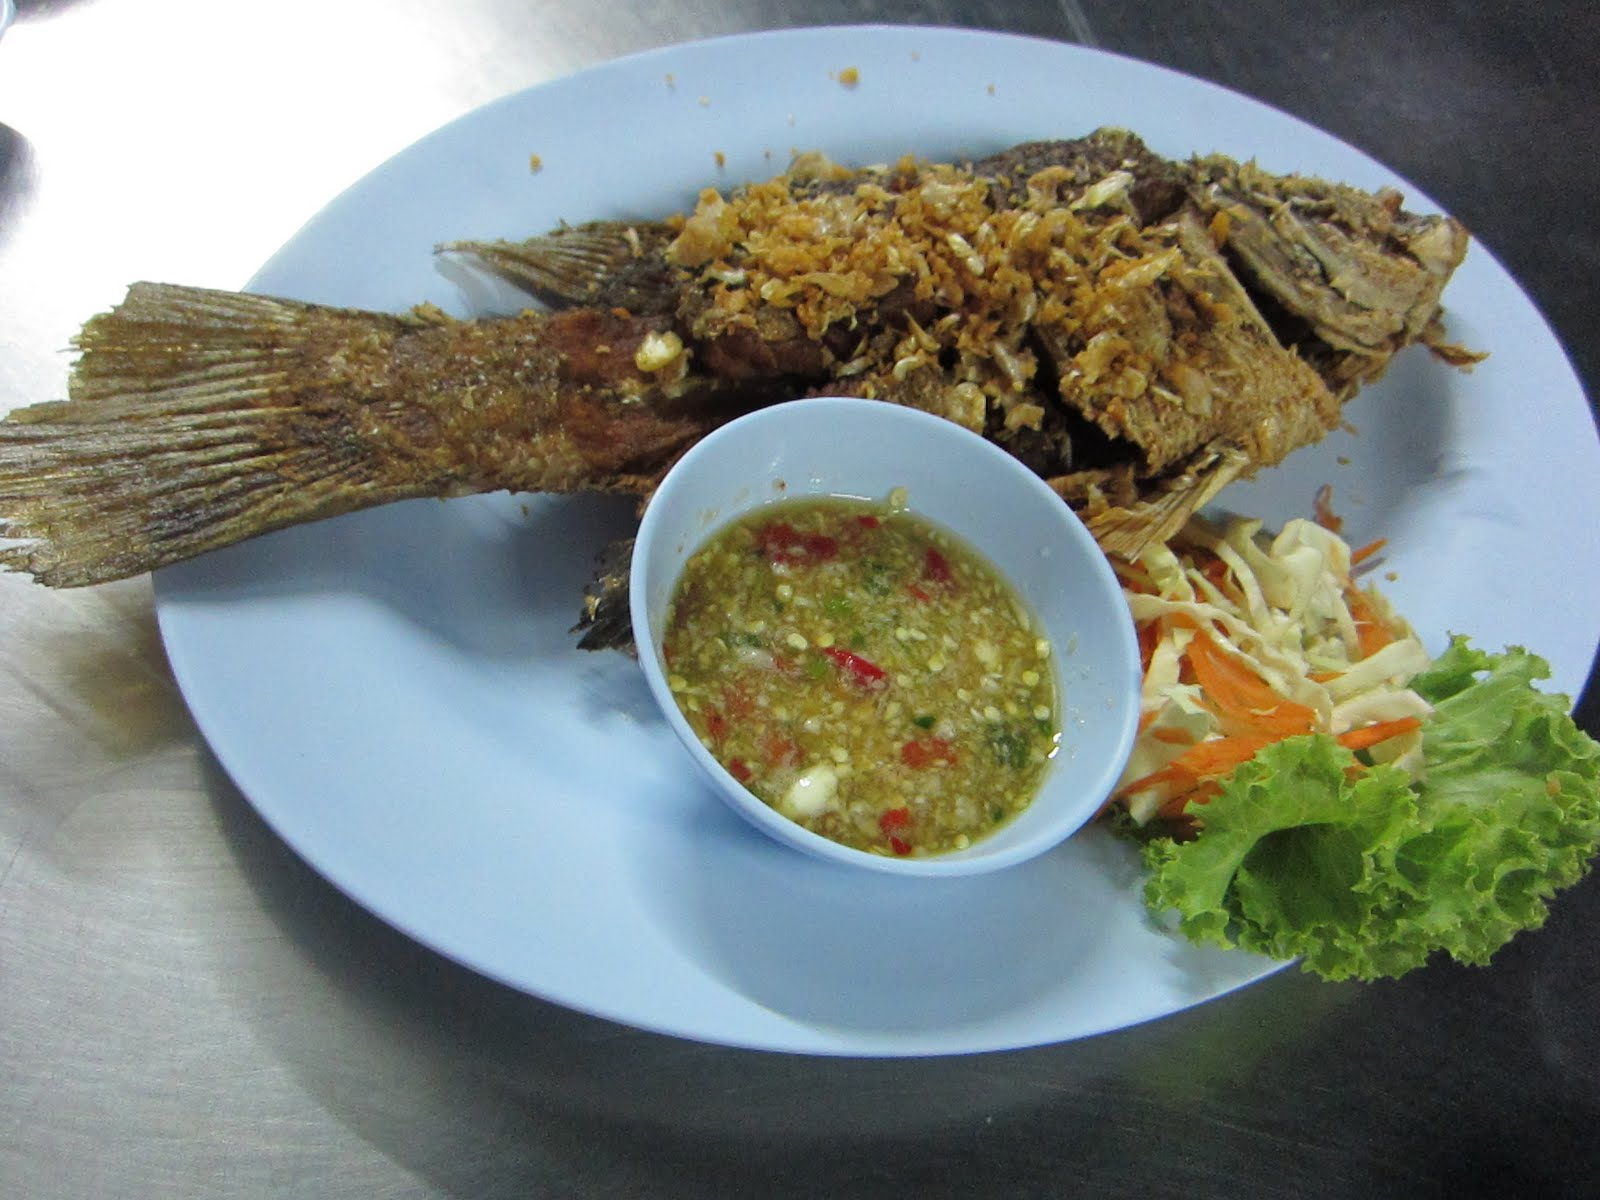 Kaow Tom IMF - International Monetary Fund Boiled Rice | LoLo-Eatable